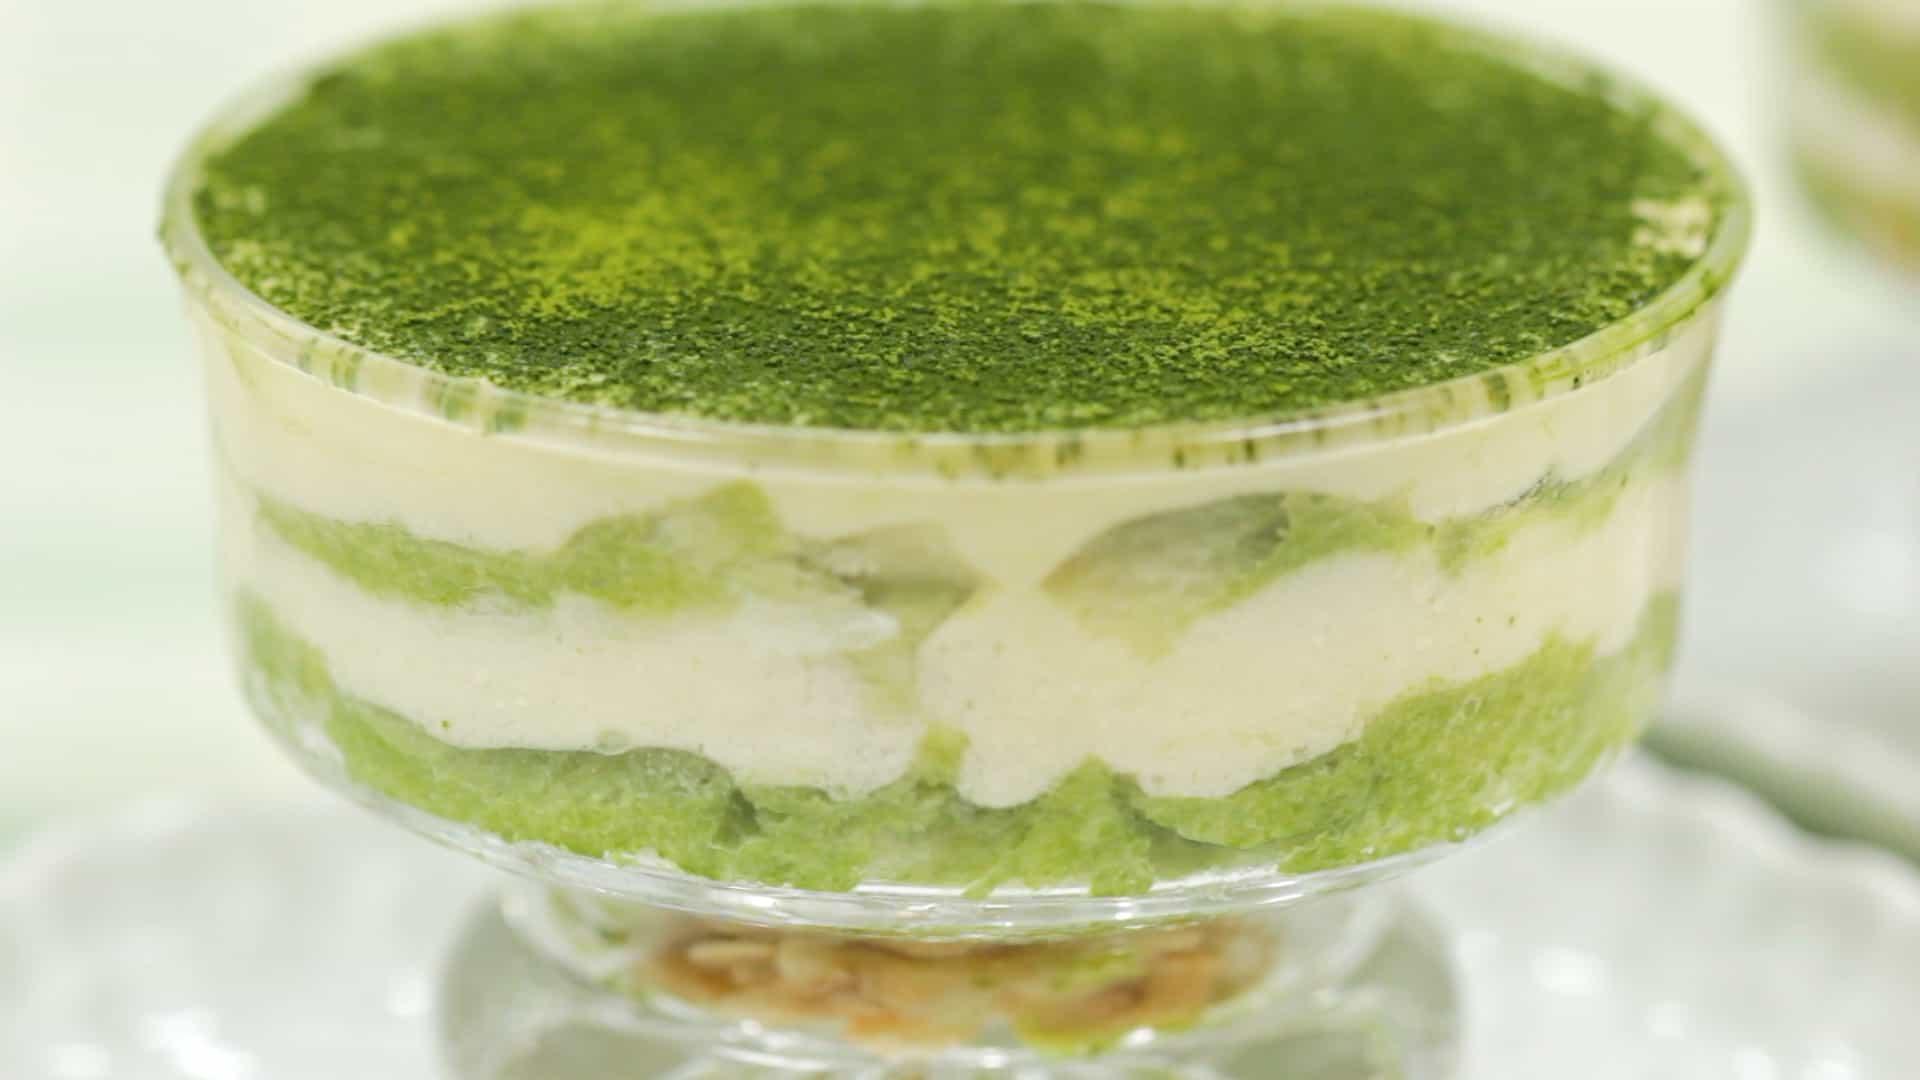 Green Tea Cake Without Matcha